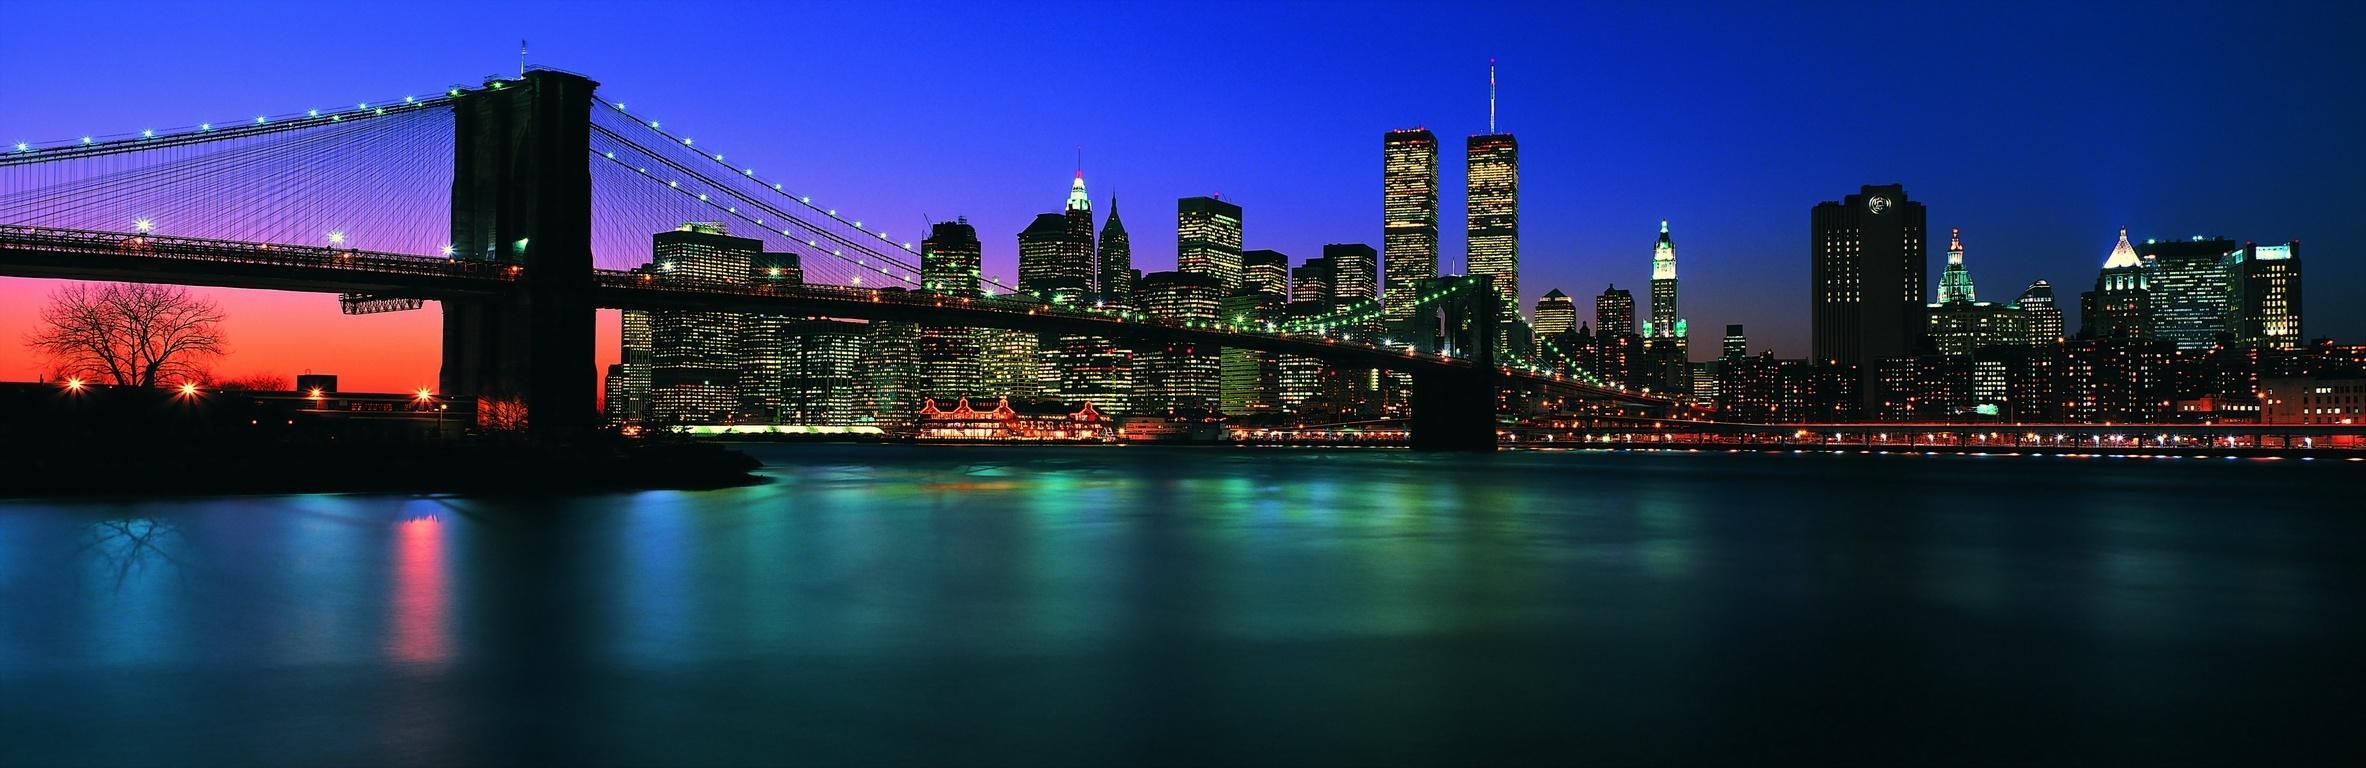 Free New York City Brooklyn Bridge panorama night lights USA America HD Desktop wallpapers backgrounds wall murals downloads A11